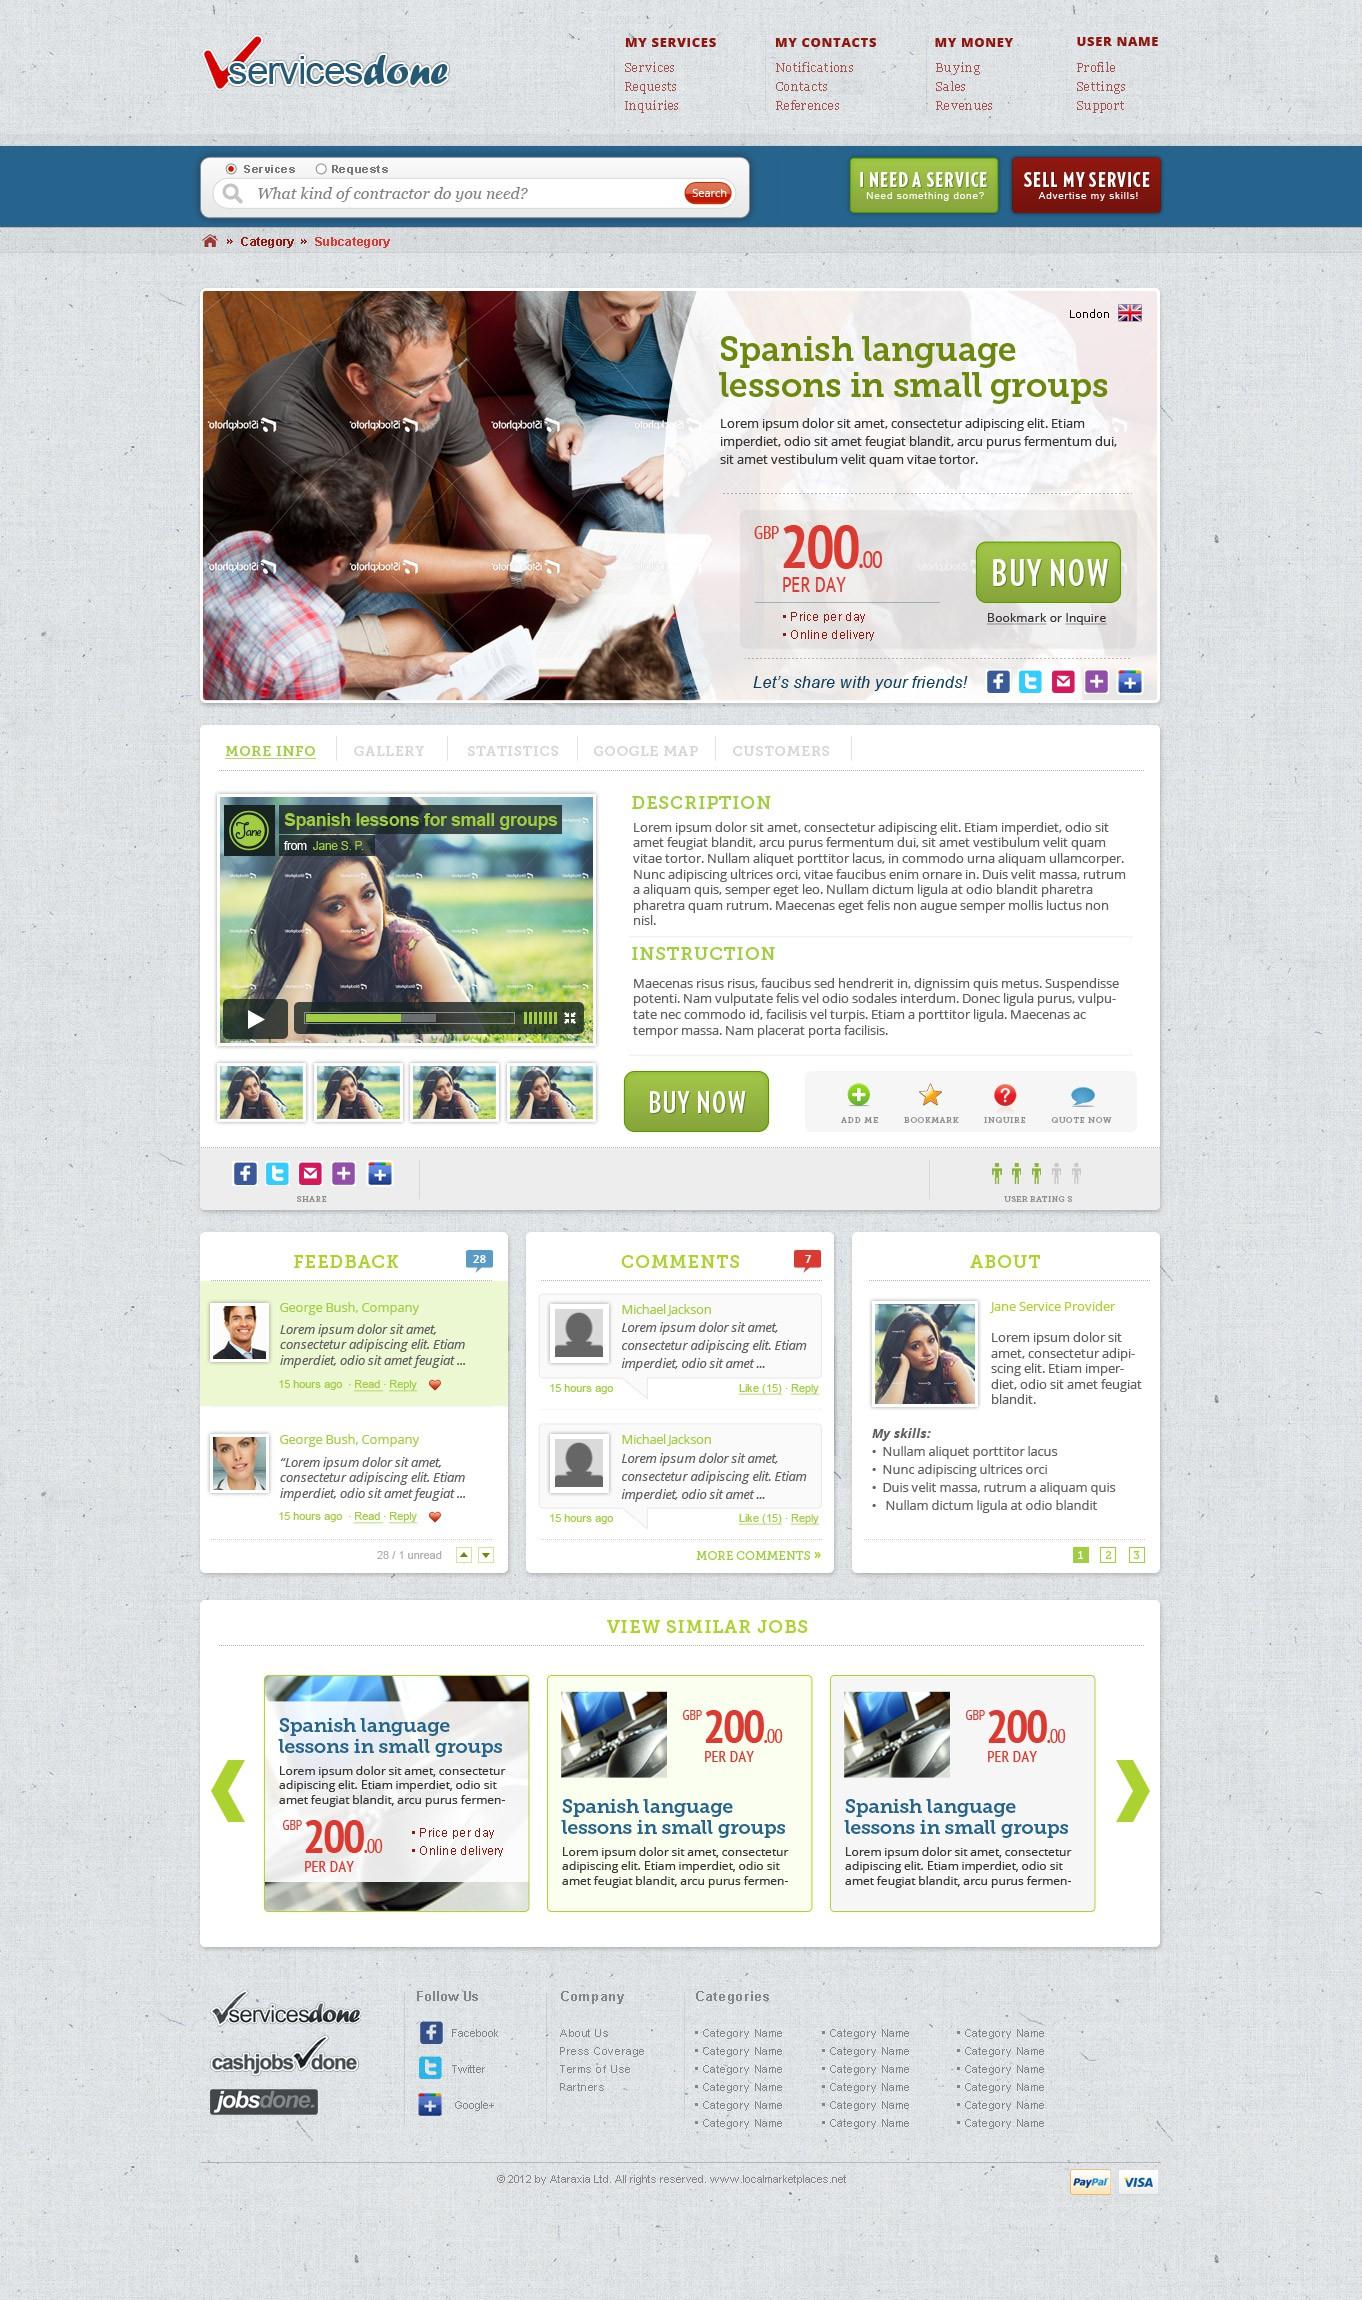 Create a web 2.0 social commerce marketplace design: be creative!